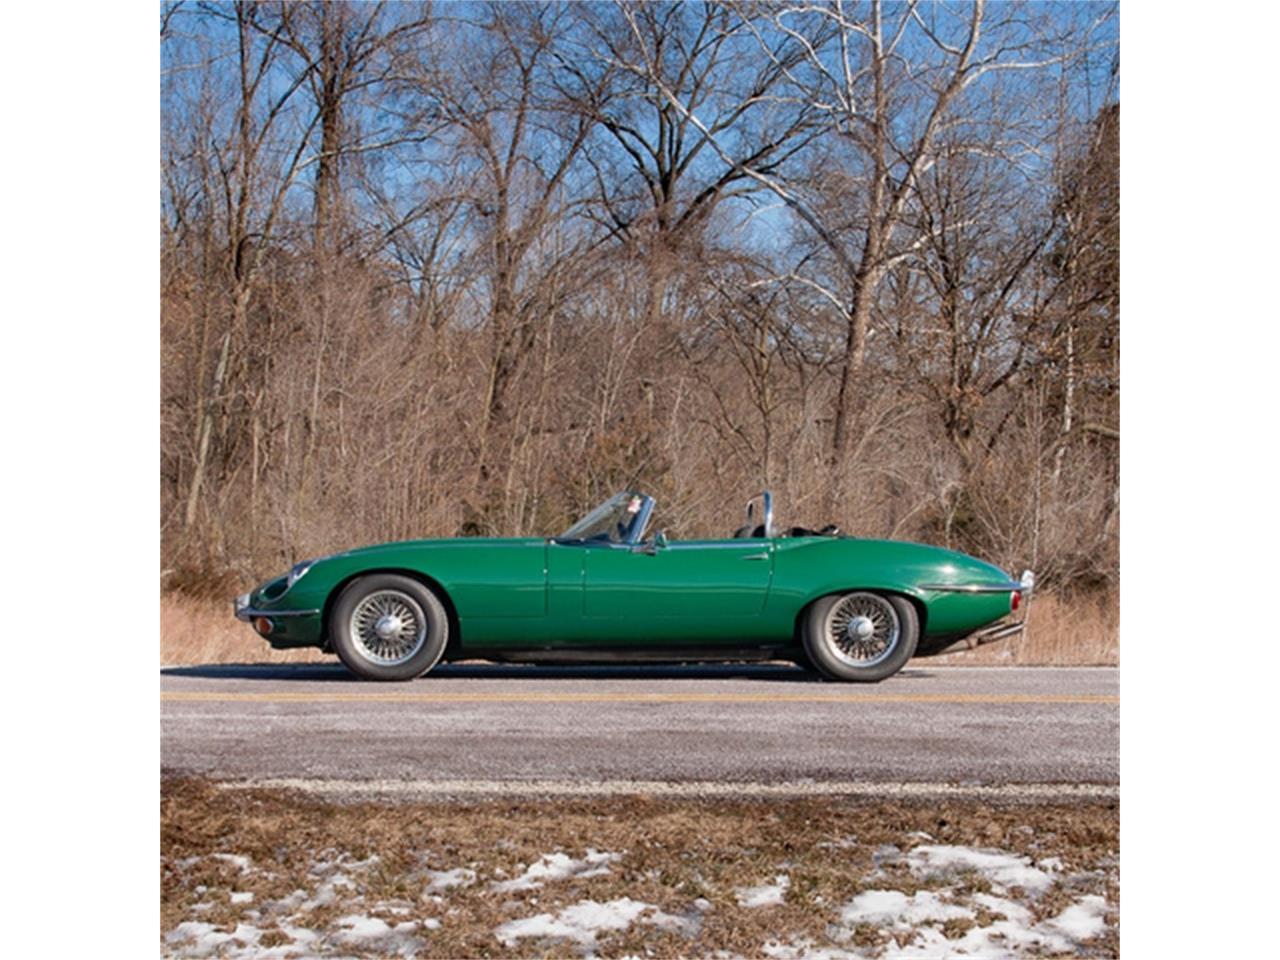 Large Picture of Classic '71 Jaguar E-Type located in Missouri - $36,900.00 - QXK8